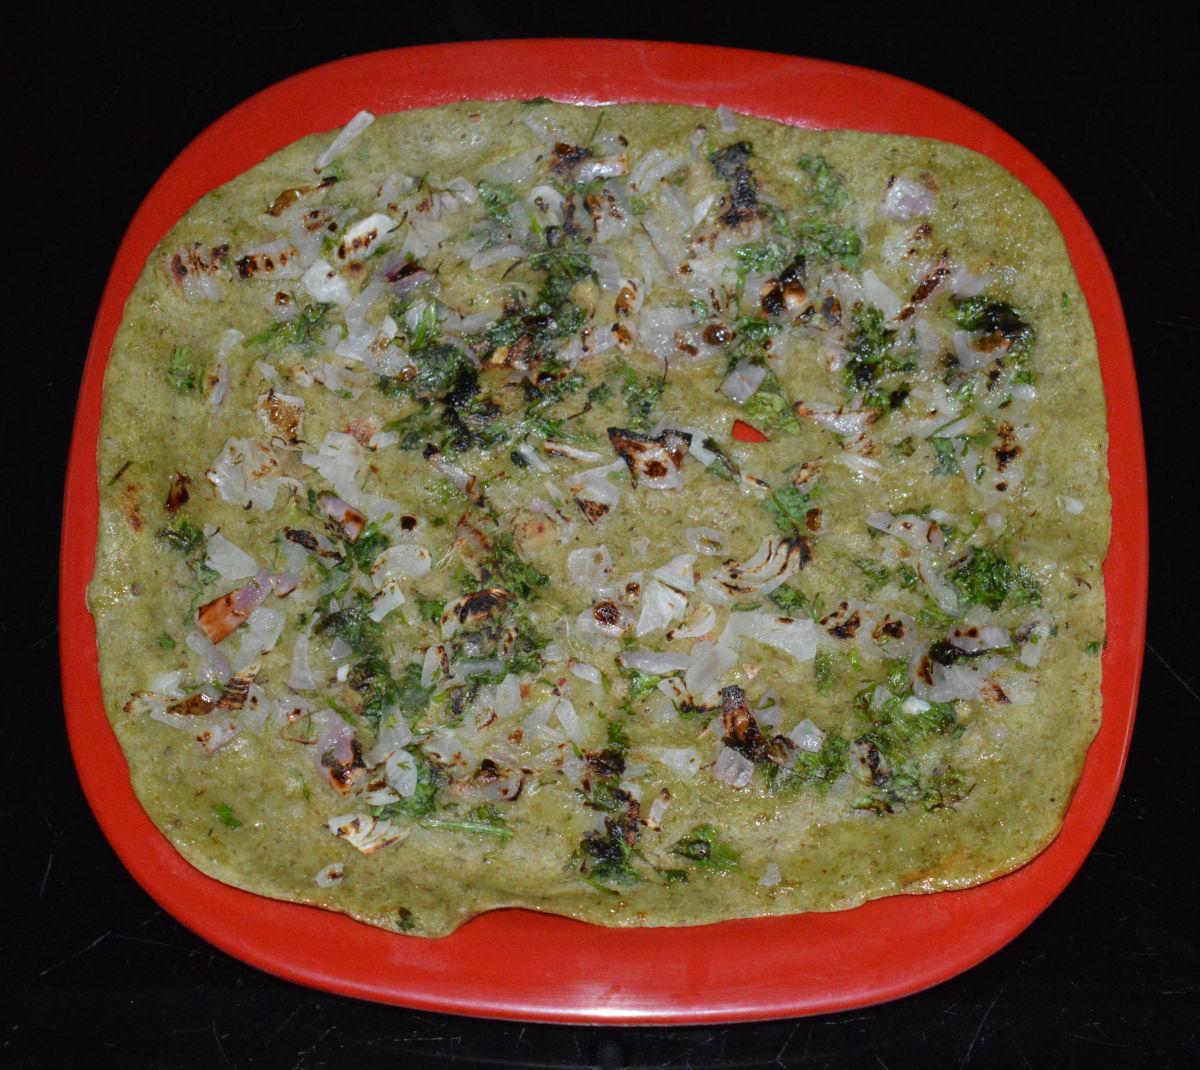 A mung bean pancake (pesarattu).